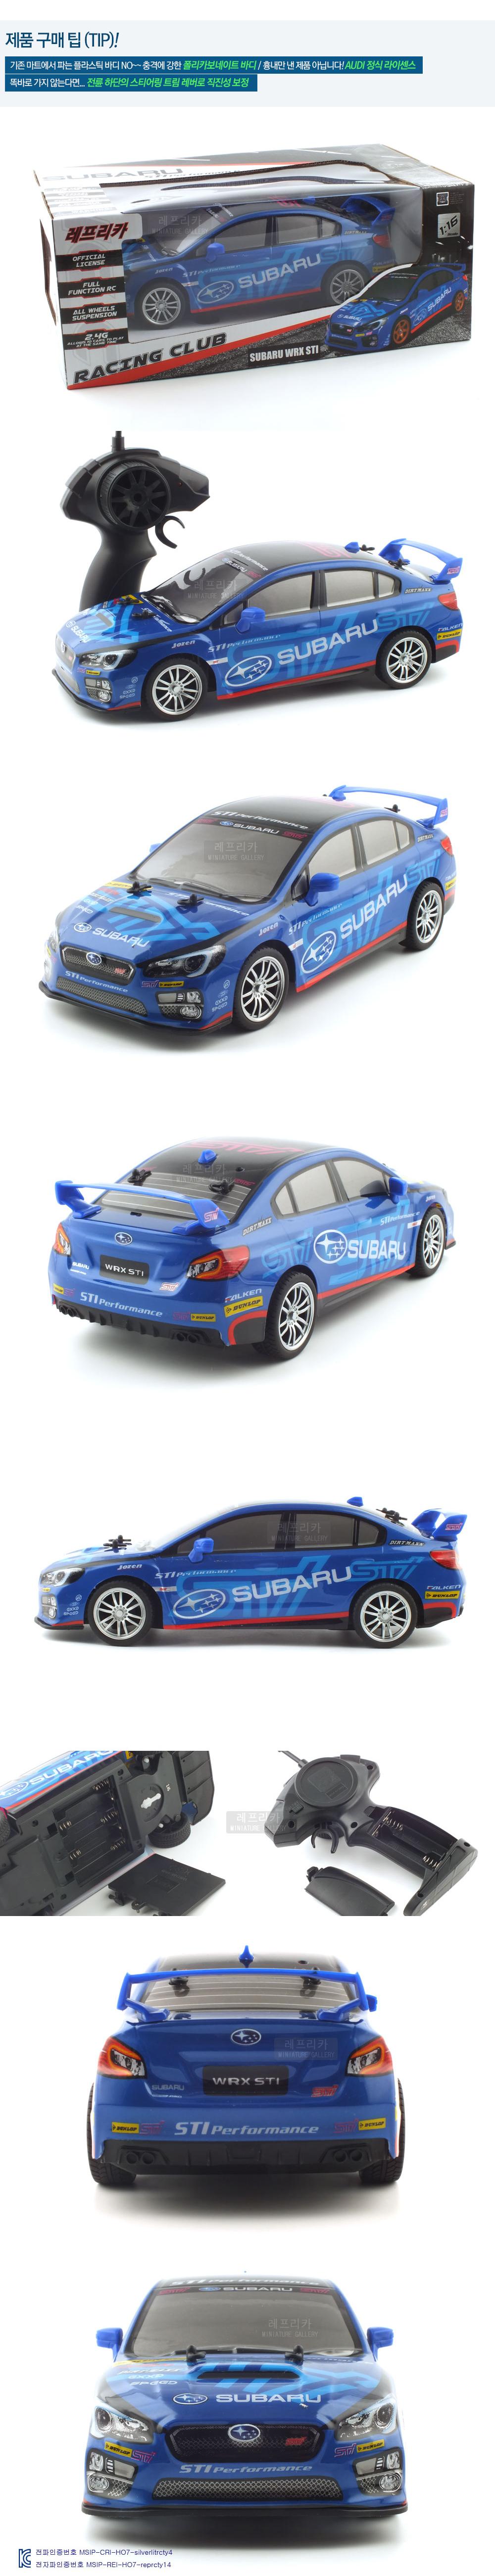 SUBARU WRX STi (HEX990395DE) 스바루 무선조종자동차 - 레프리카, 60,000원, R/C 카, 전동 R/C카